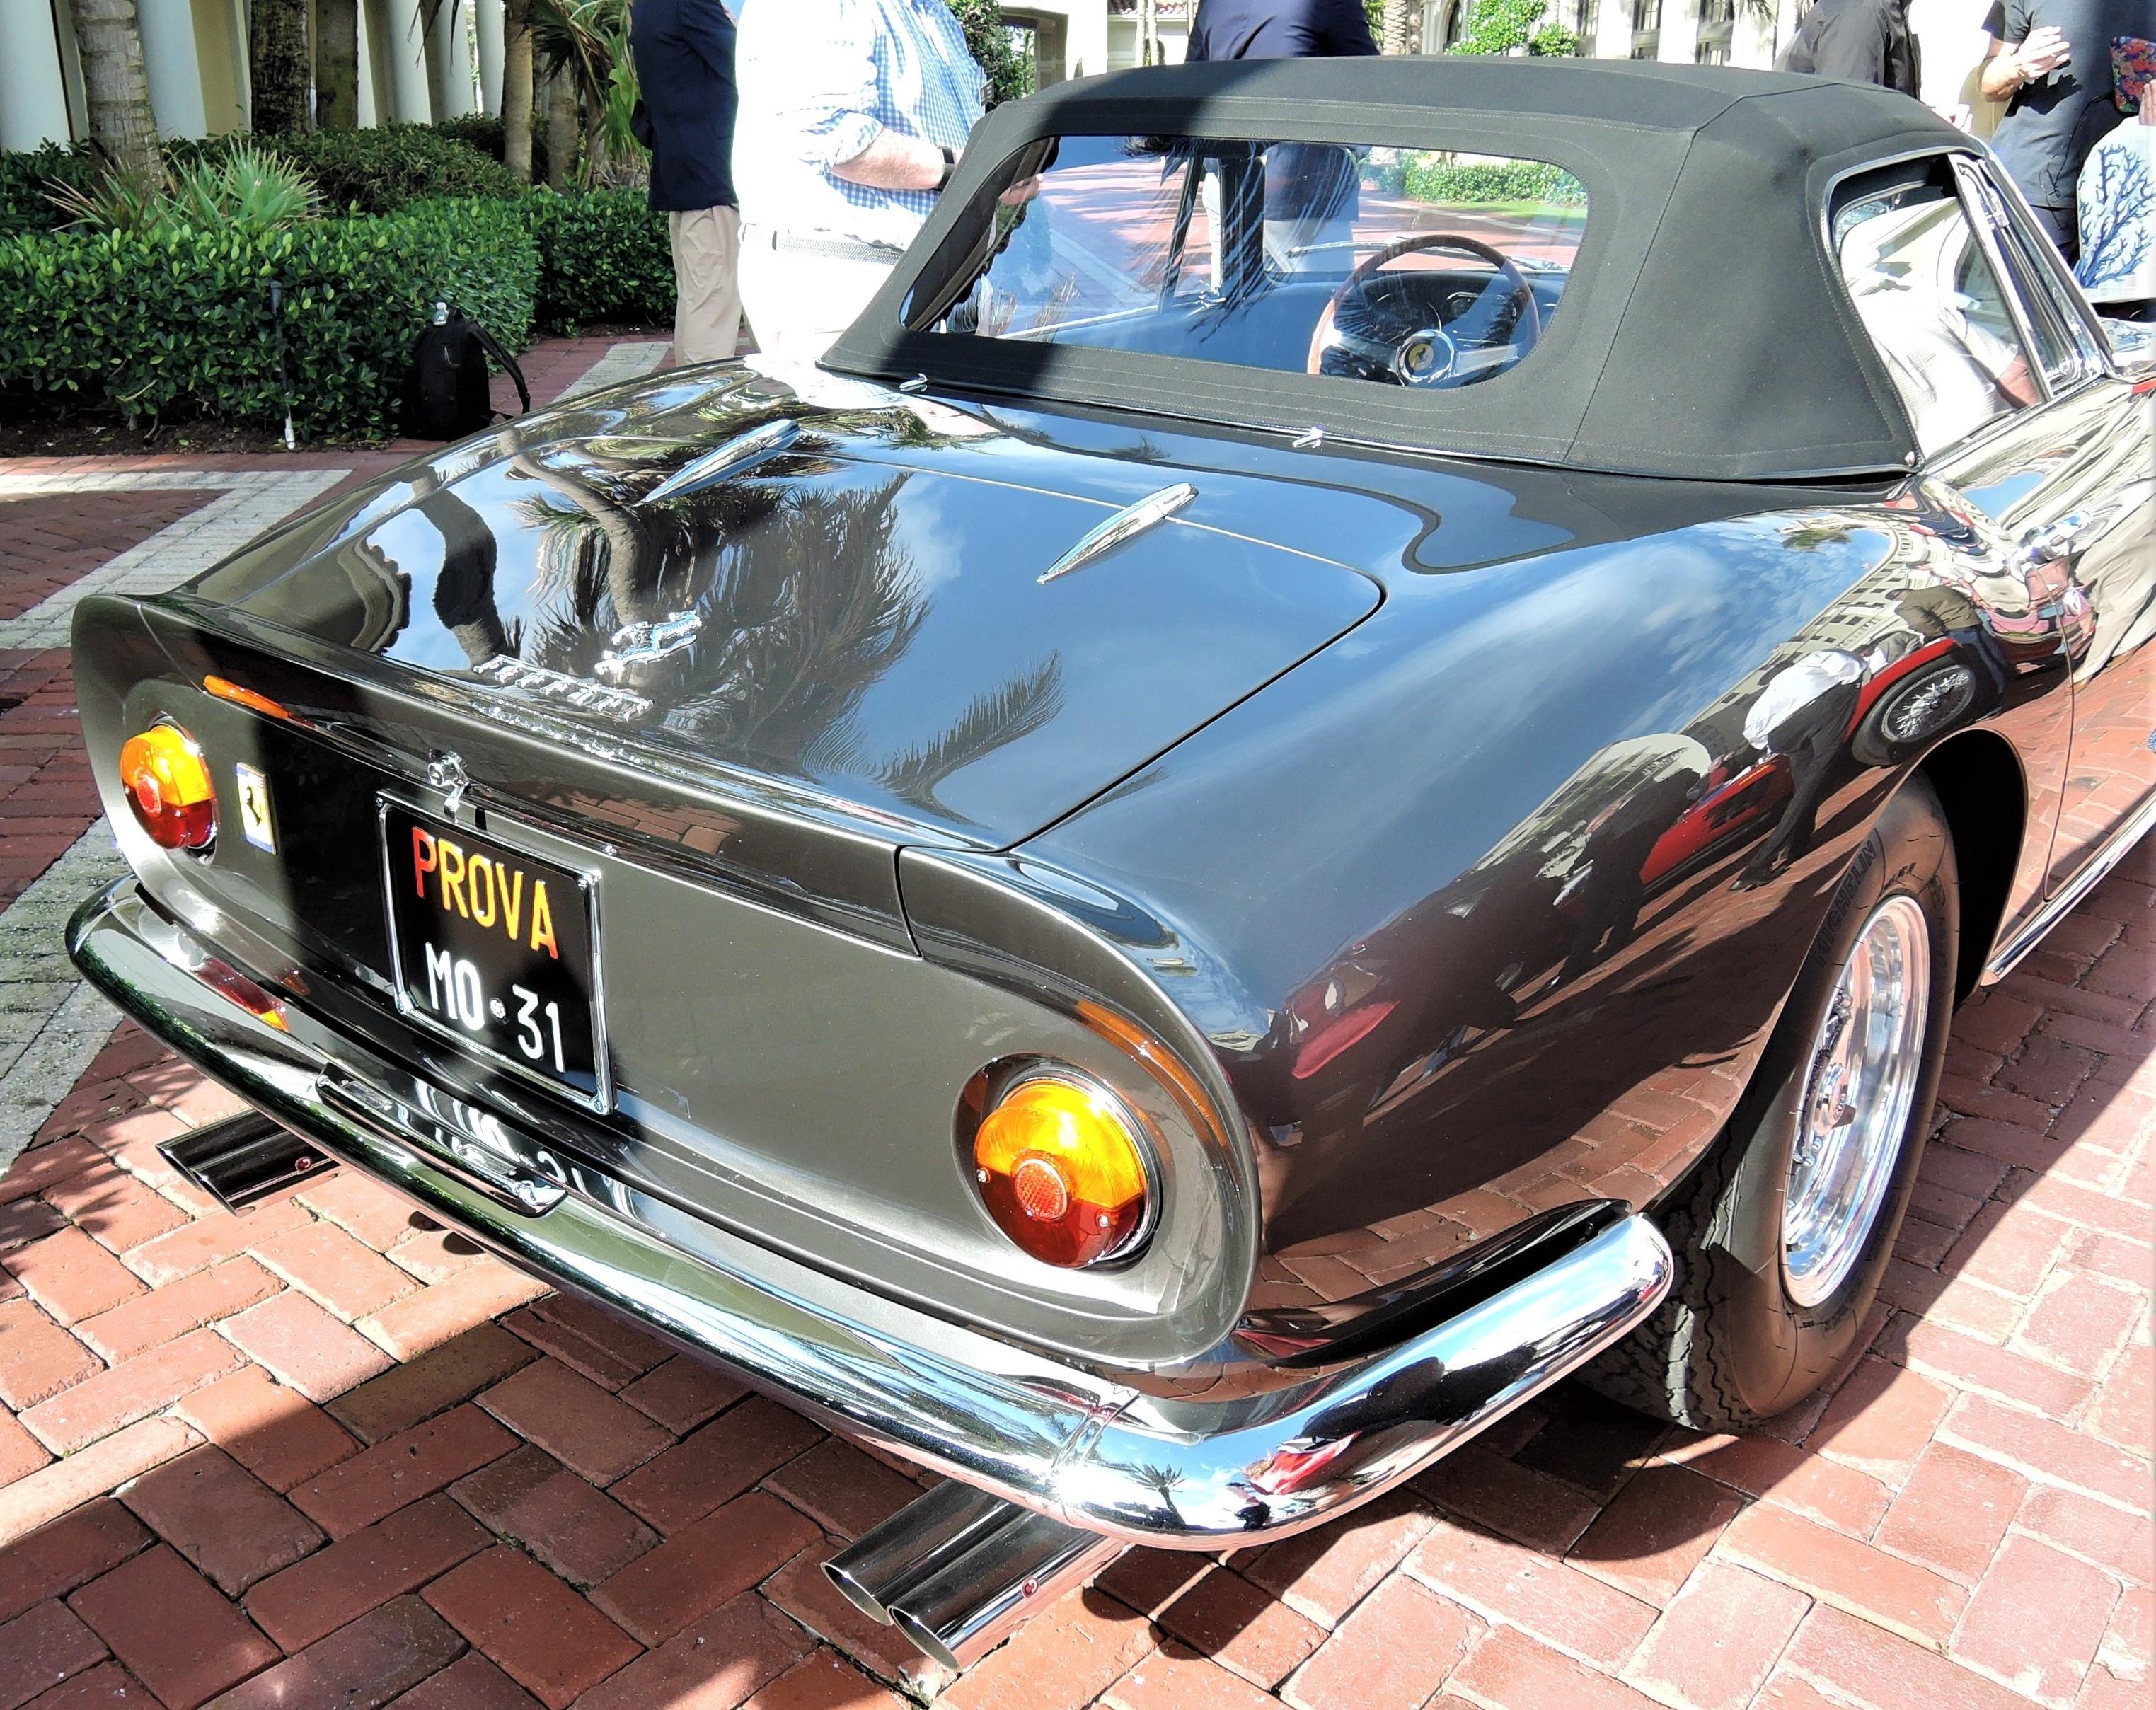 1967 Ferrari 275 GTS/4 NART Spyder; Sn 11057 - Cavallino 2018